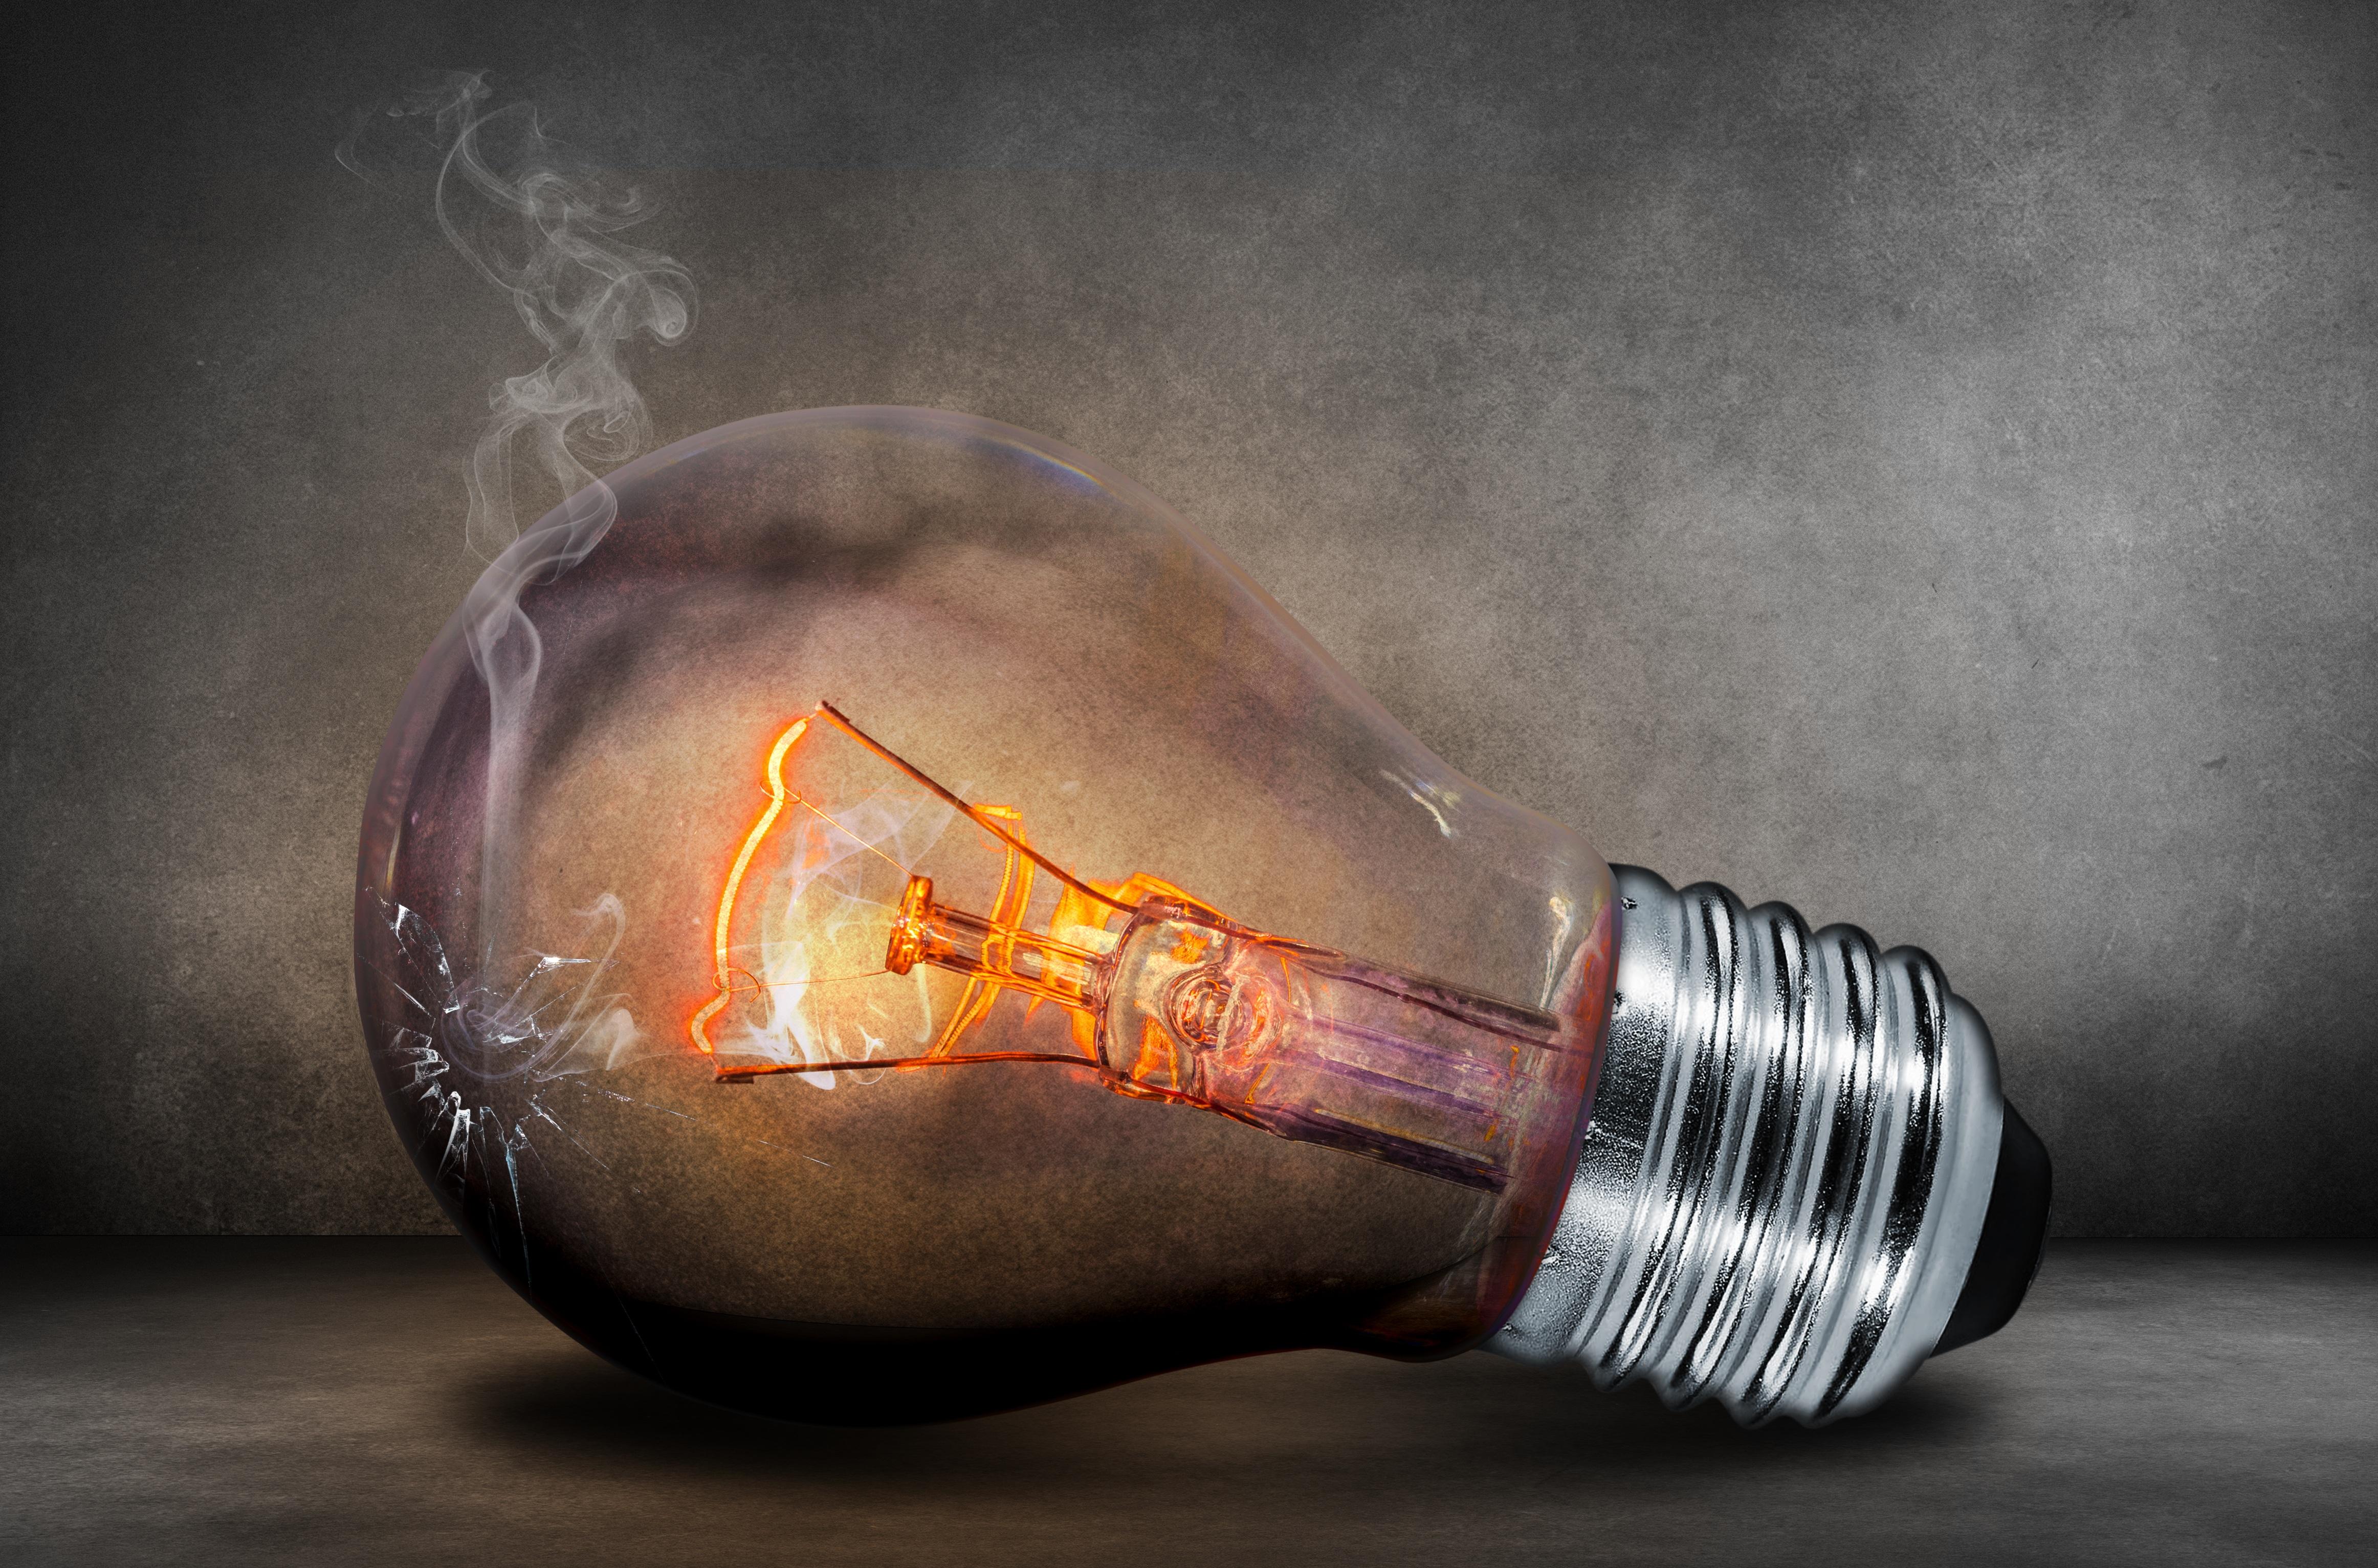 Light Macro Glow Darkness Lamp Bulb Lighting Filament Energy Current Elektrik Wire